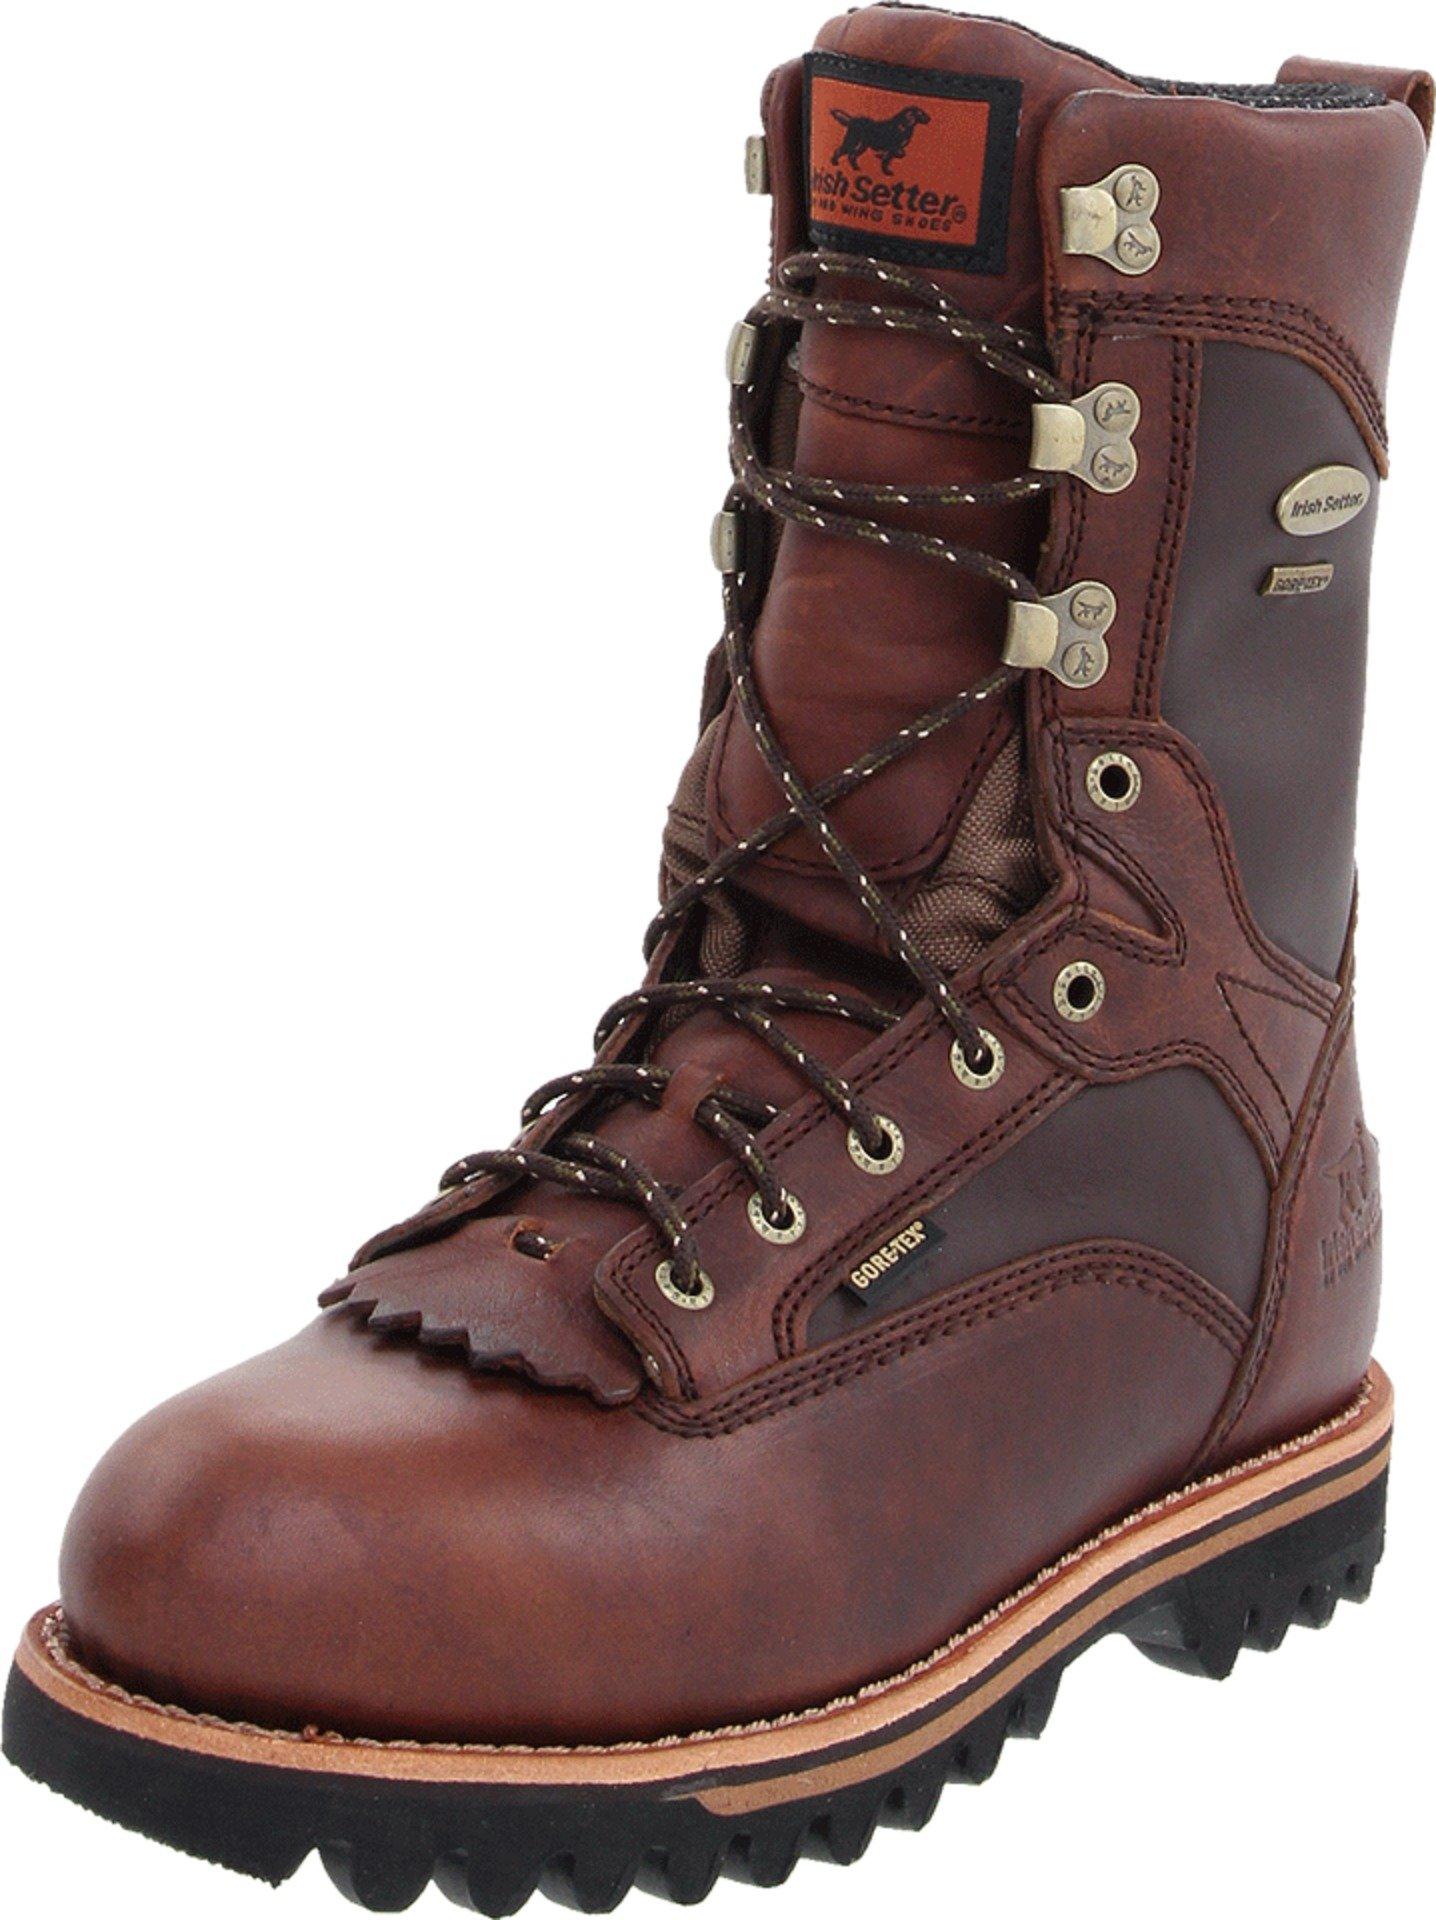 Best Waterproof Hunting Boots